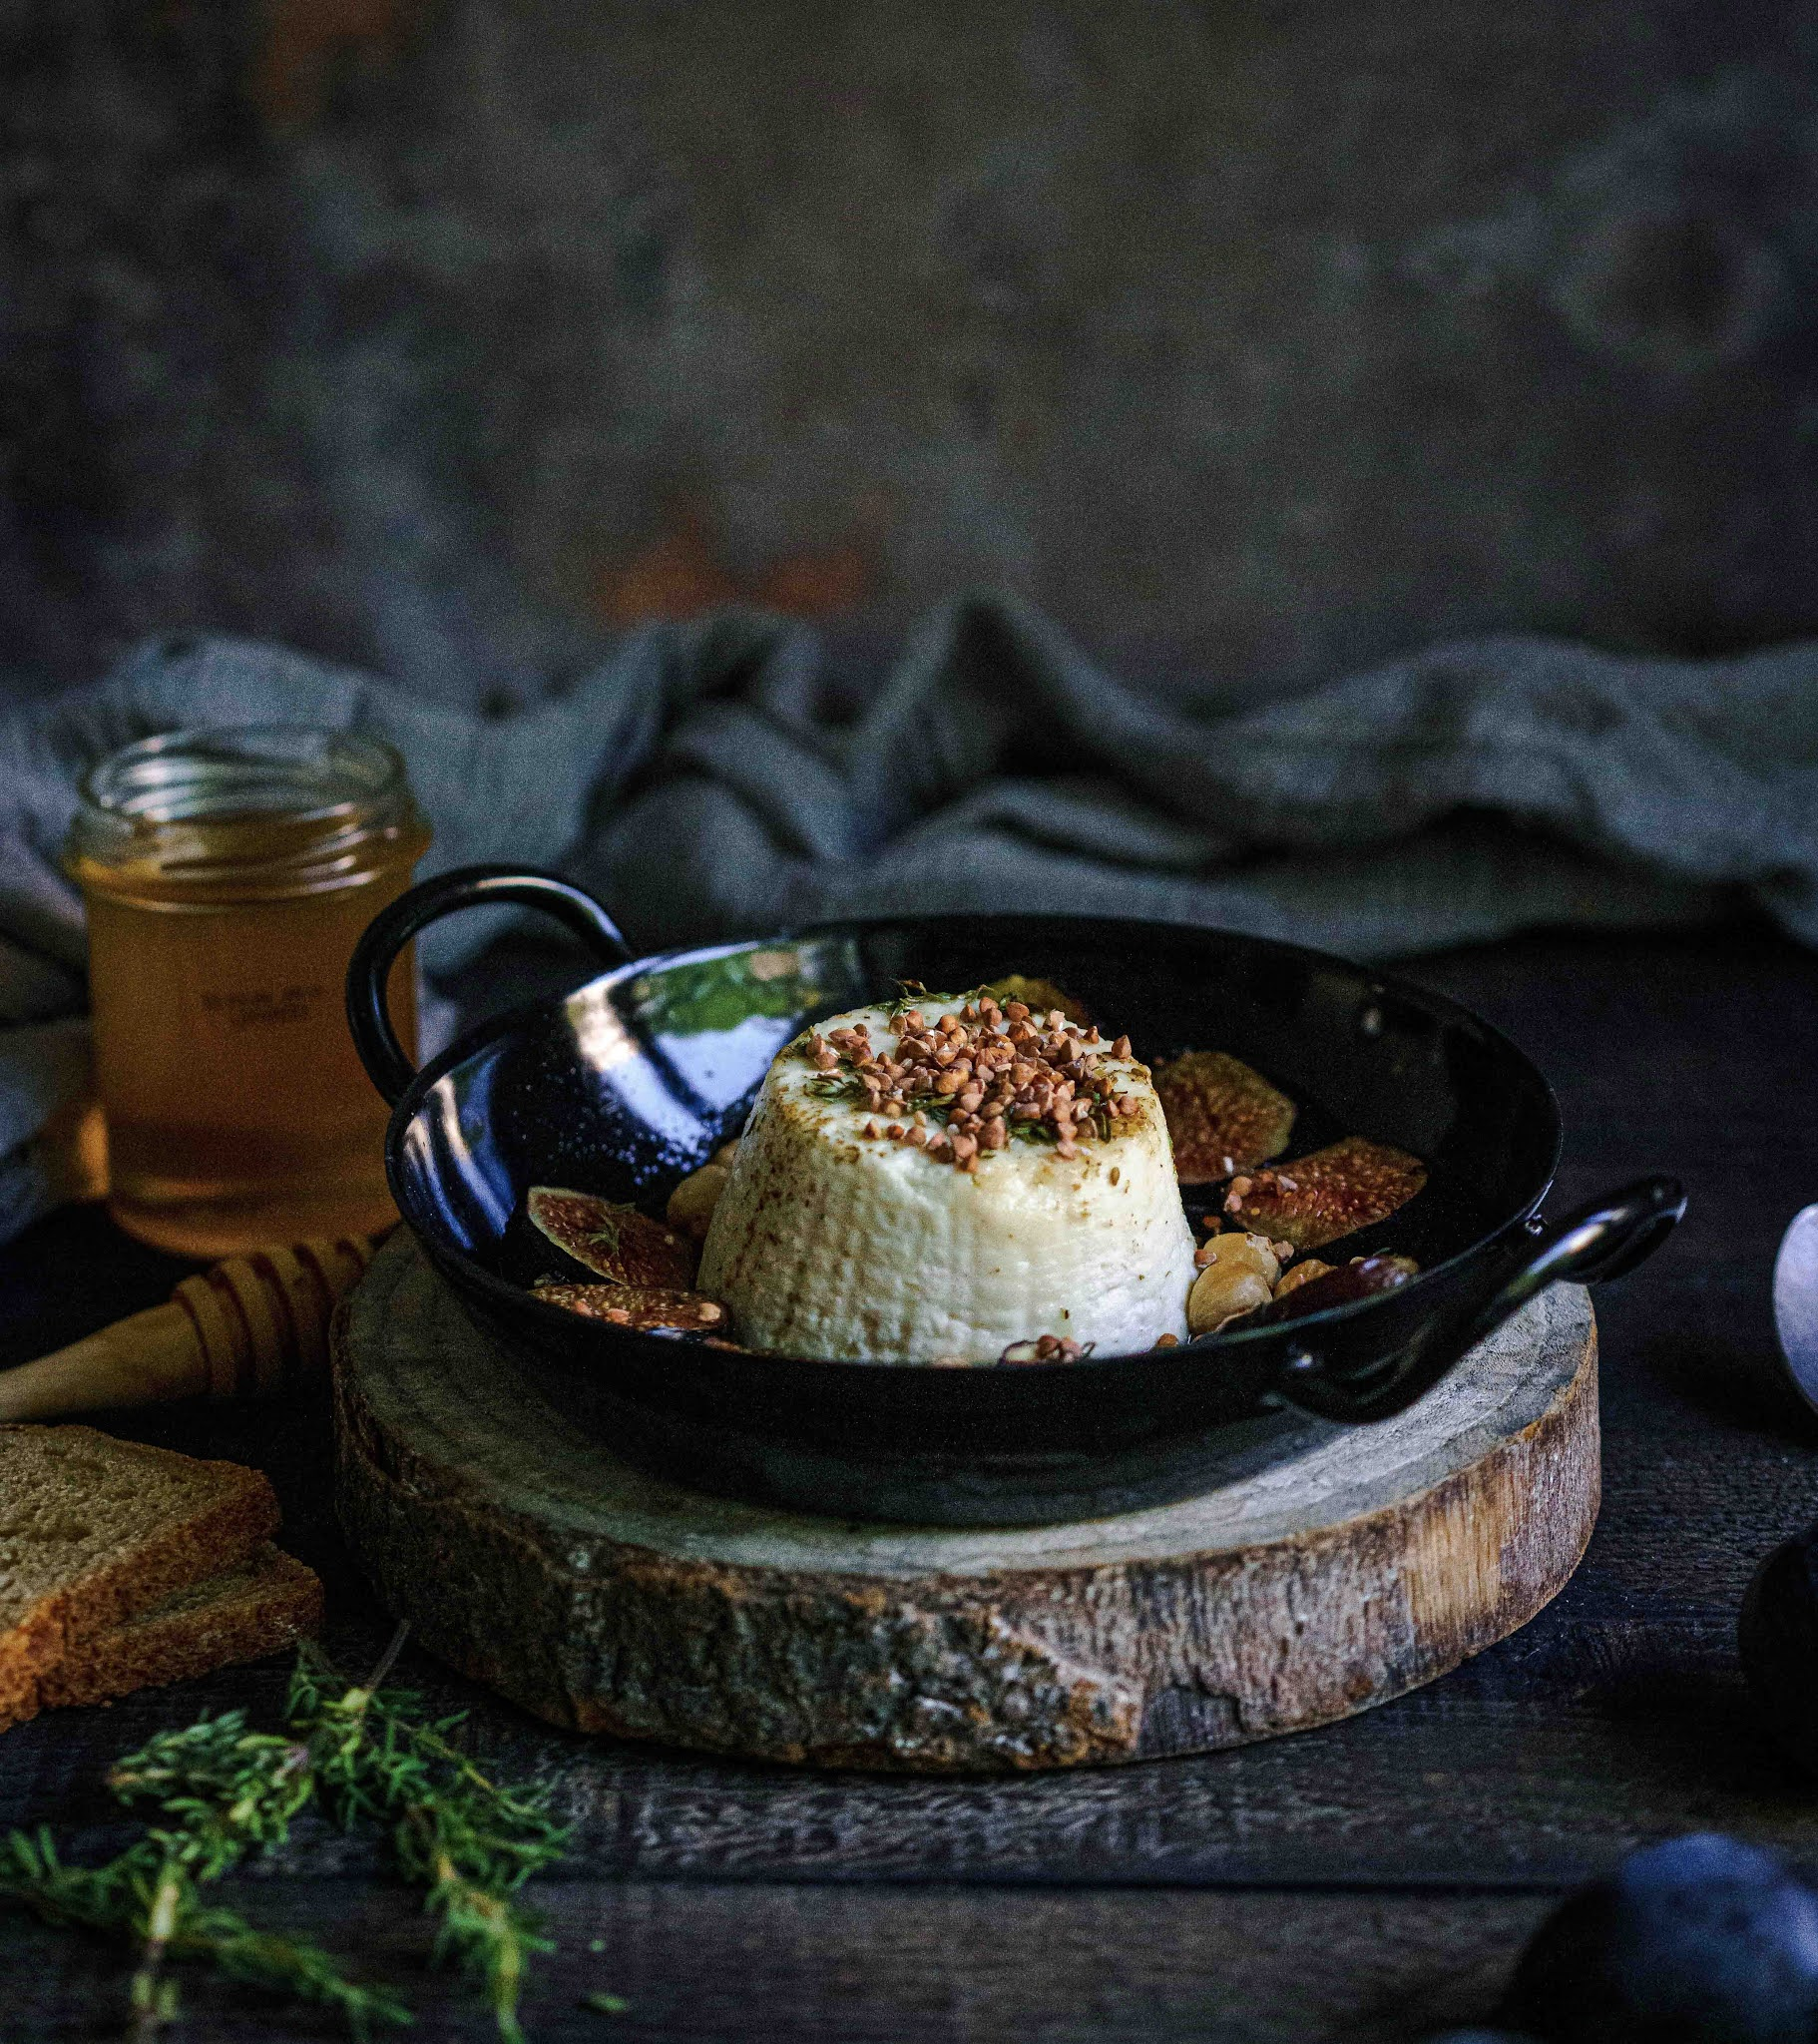 ricotta, fromage italien , recette rapide